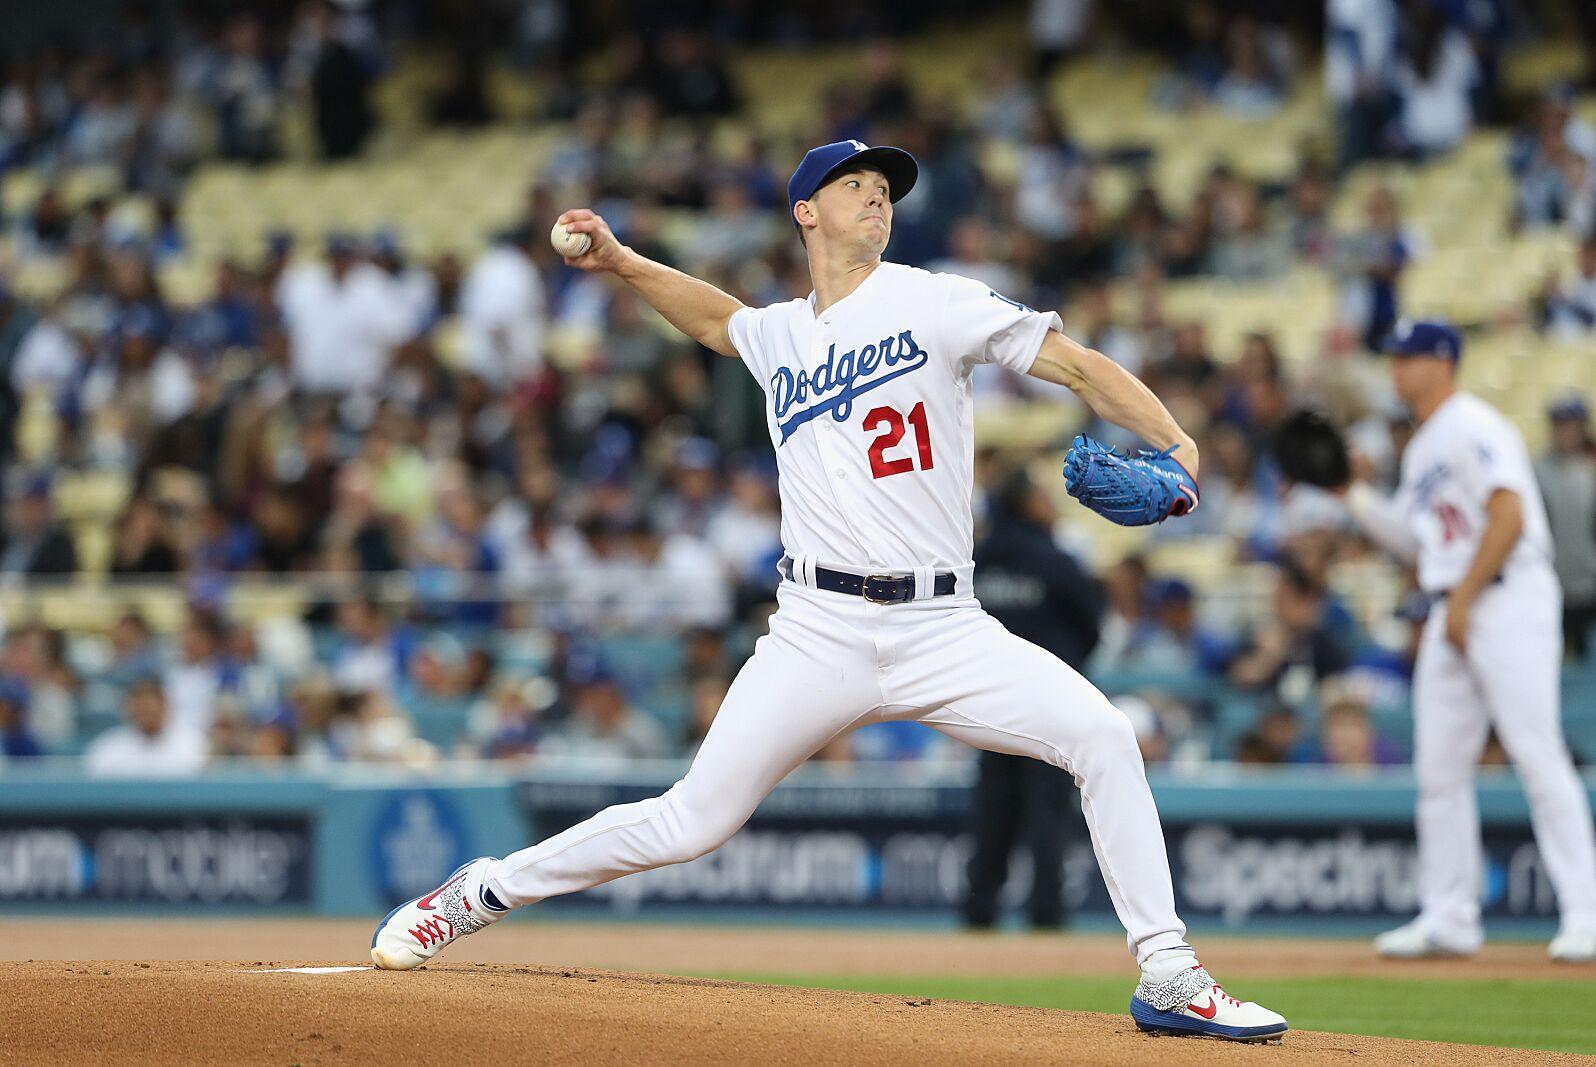 Main DraftKings MLB picks August 10: Can't whack Paddack